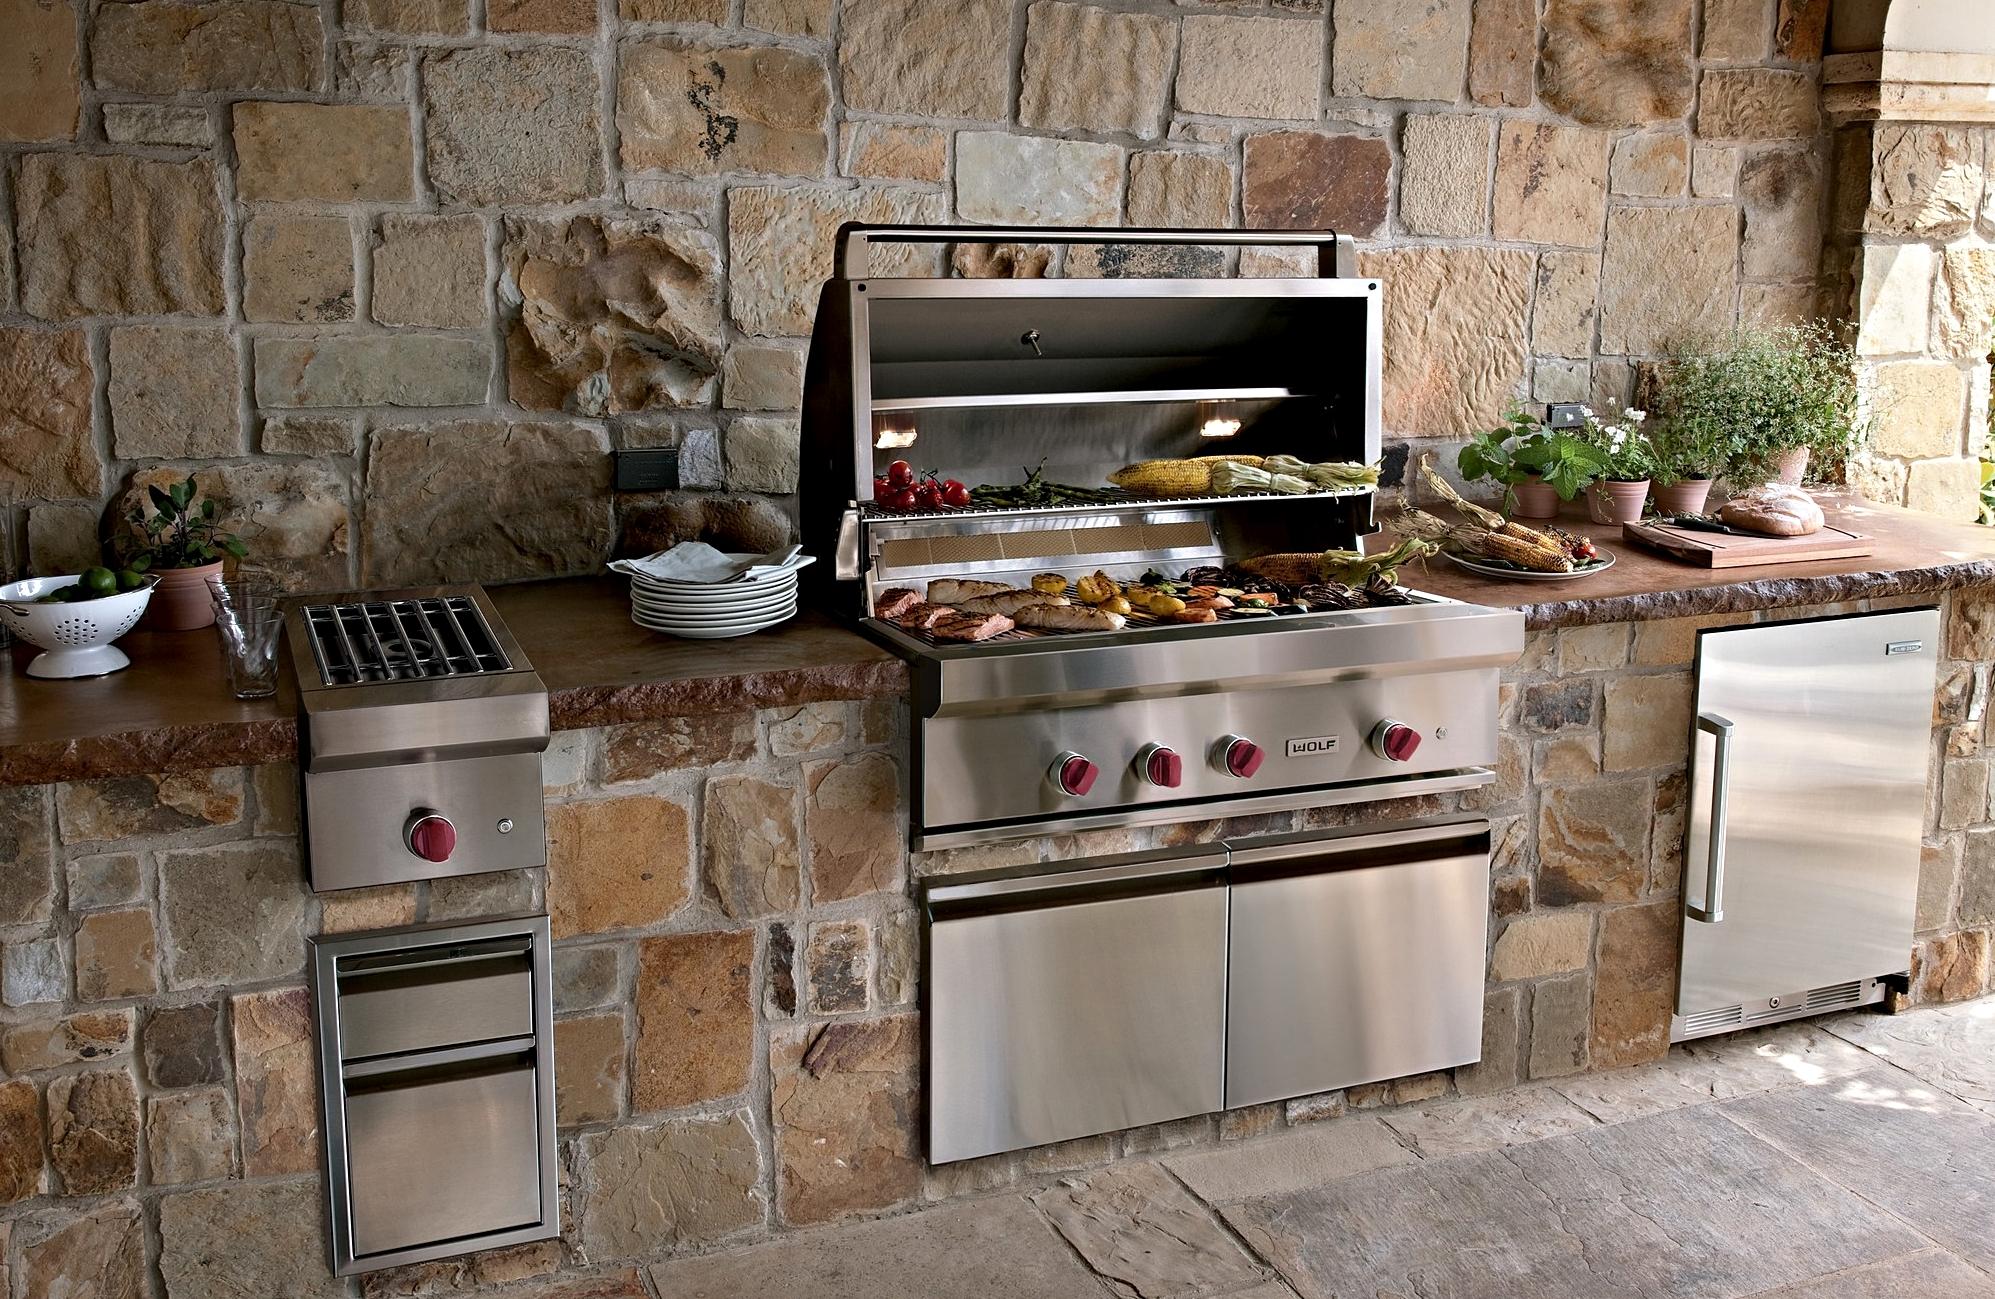 outdoor kitchen appliances photo - 1